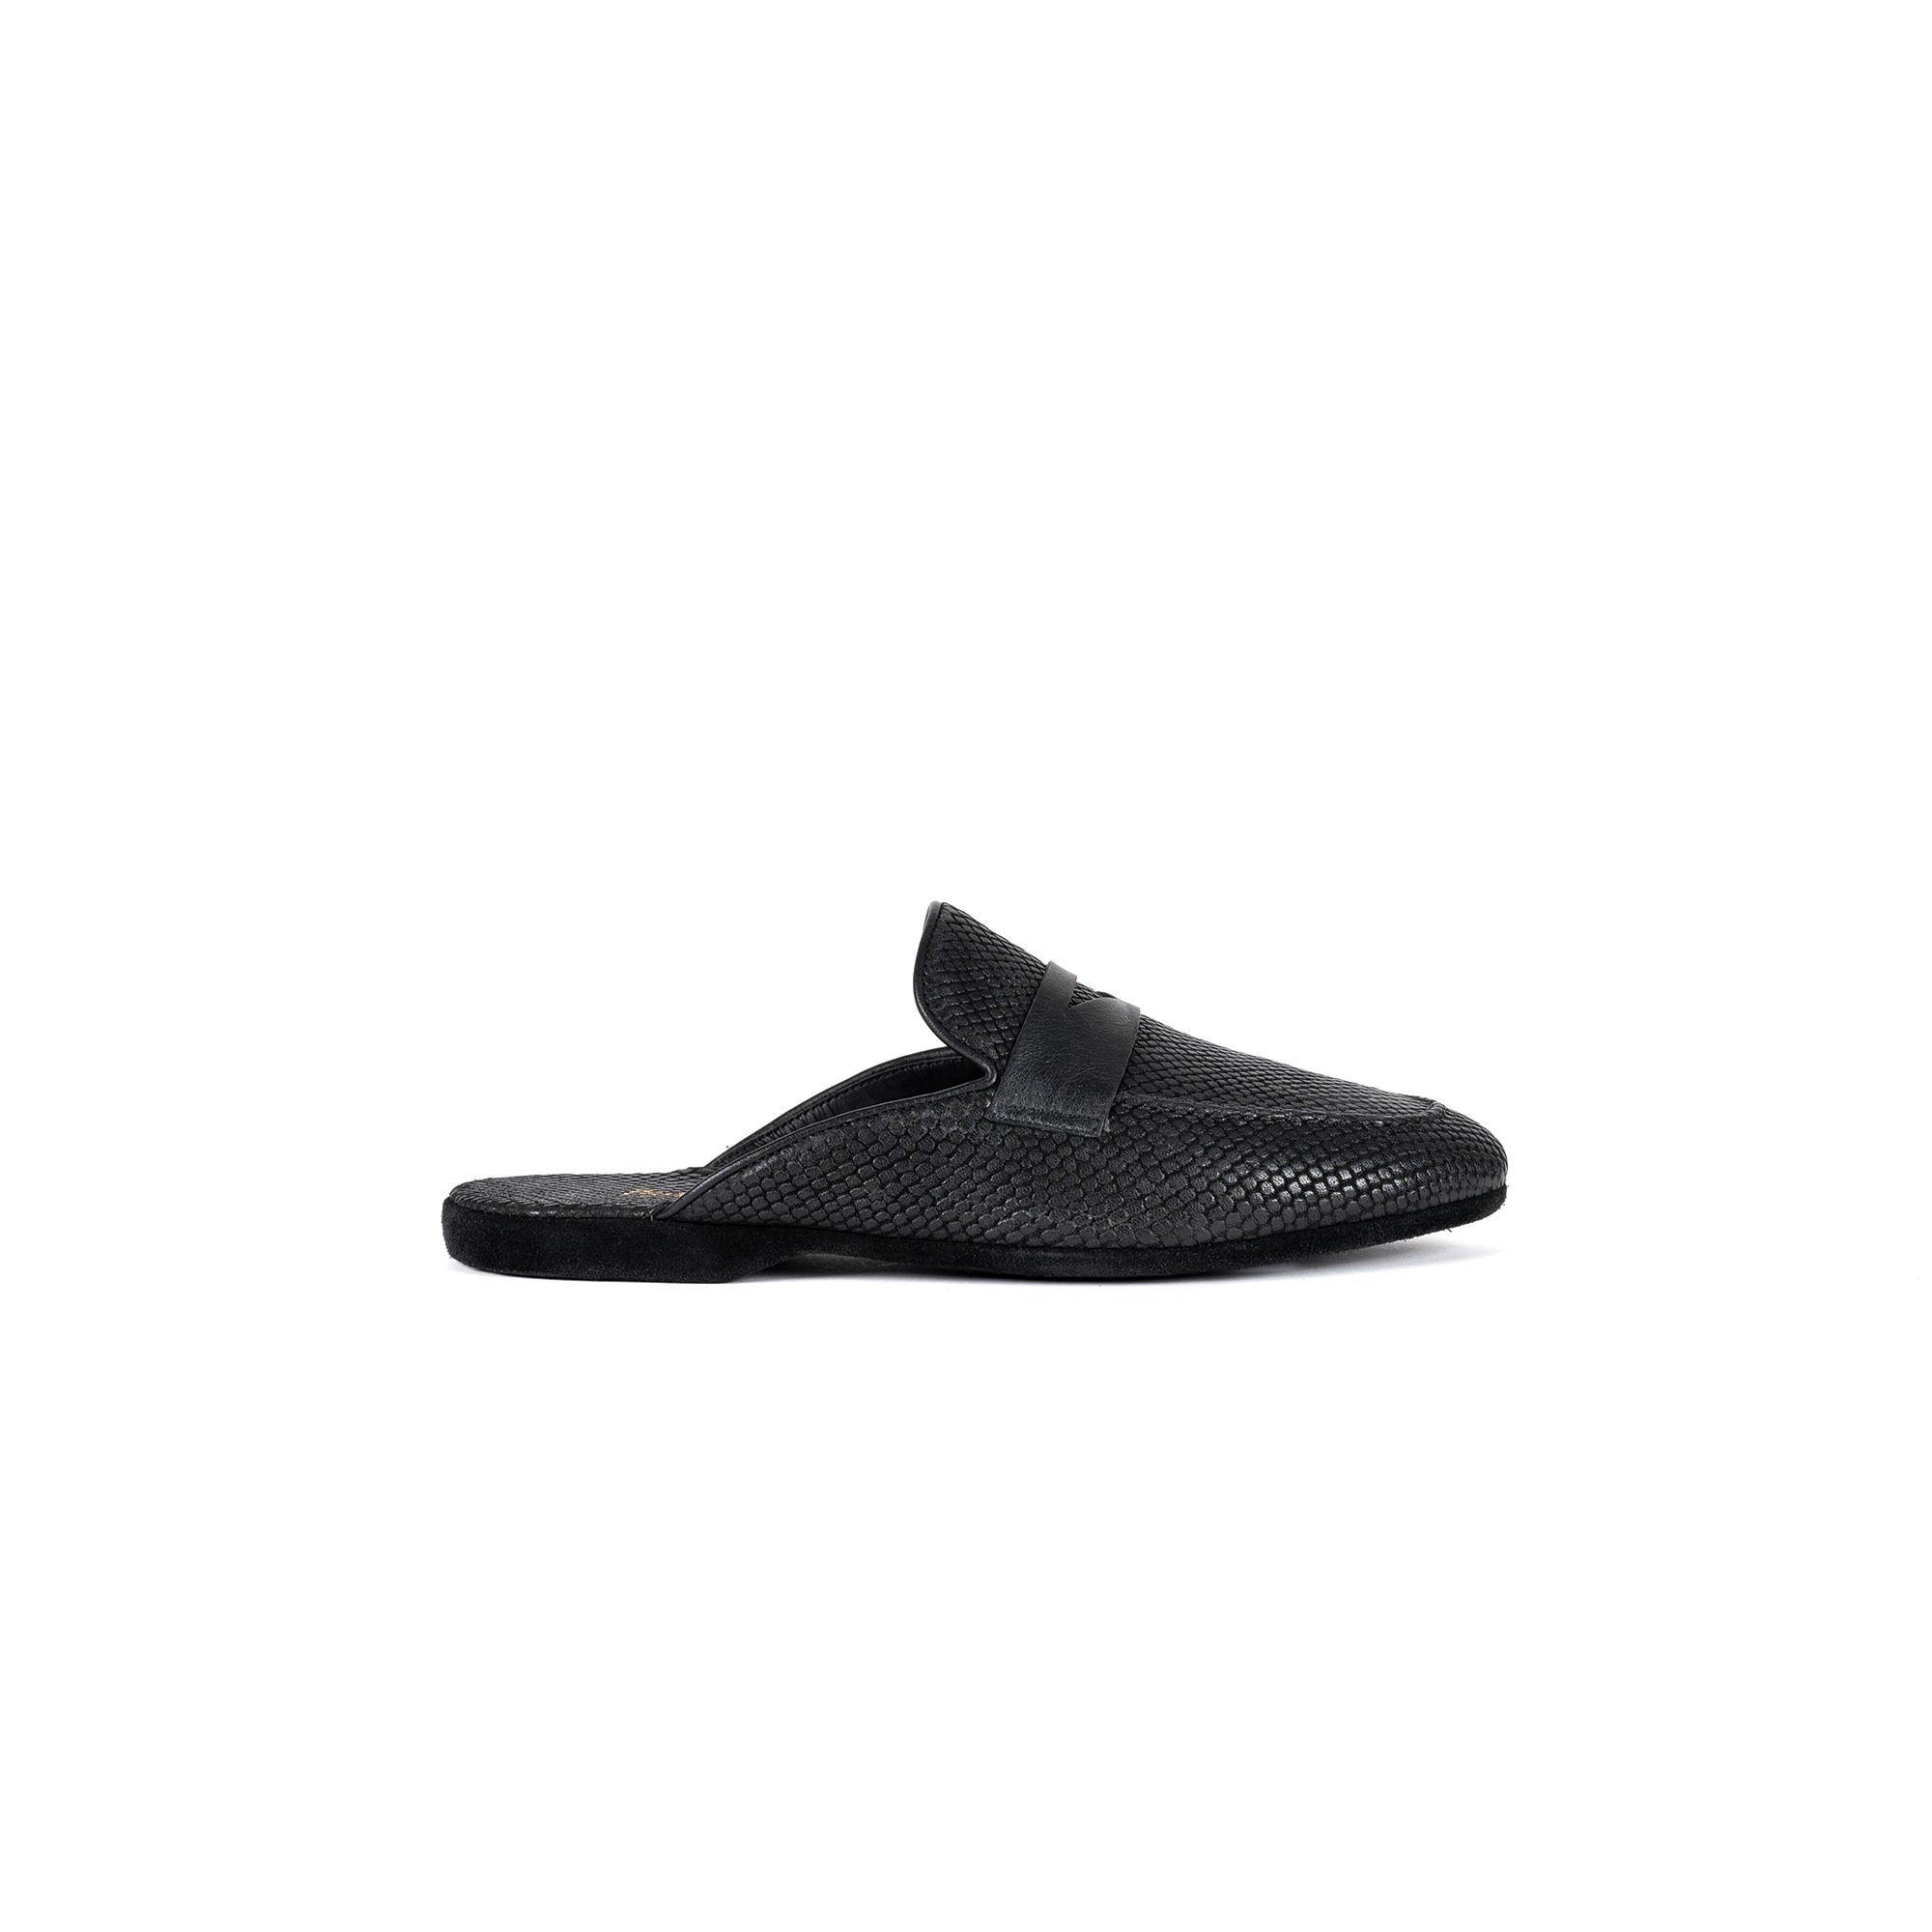 Indoor luxury slipper in black exotic print leather - Farfalla italian slippers